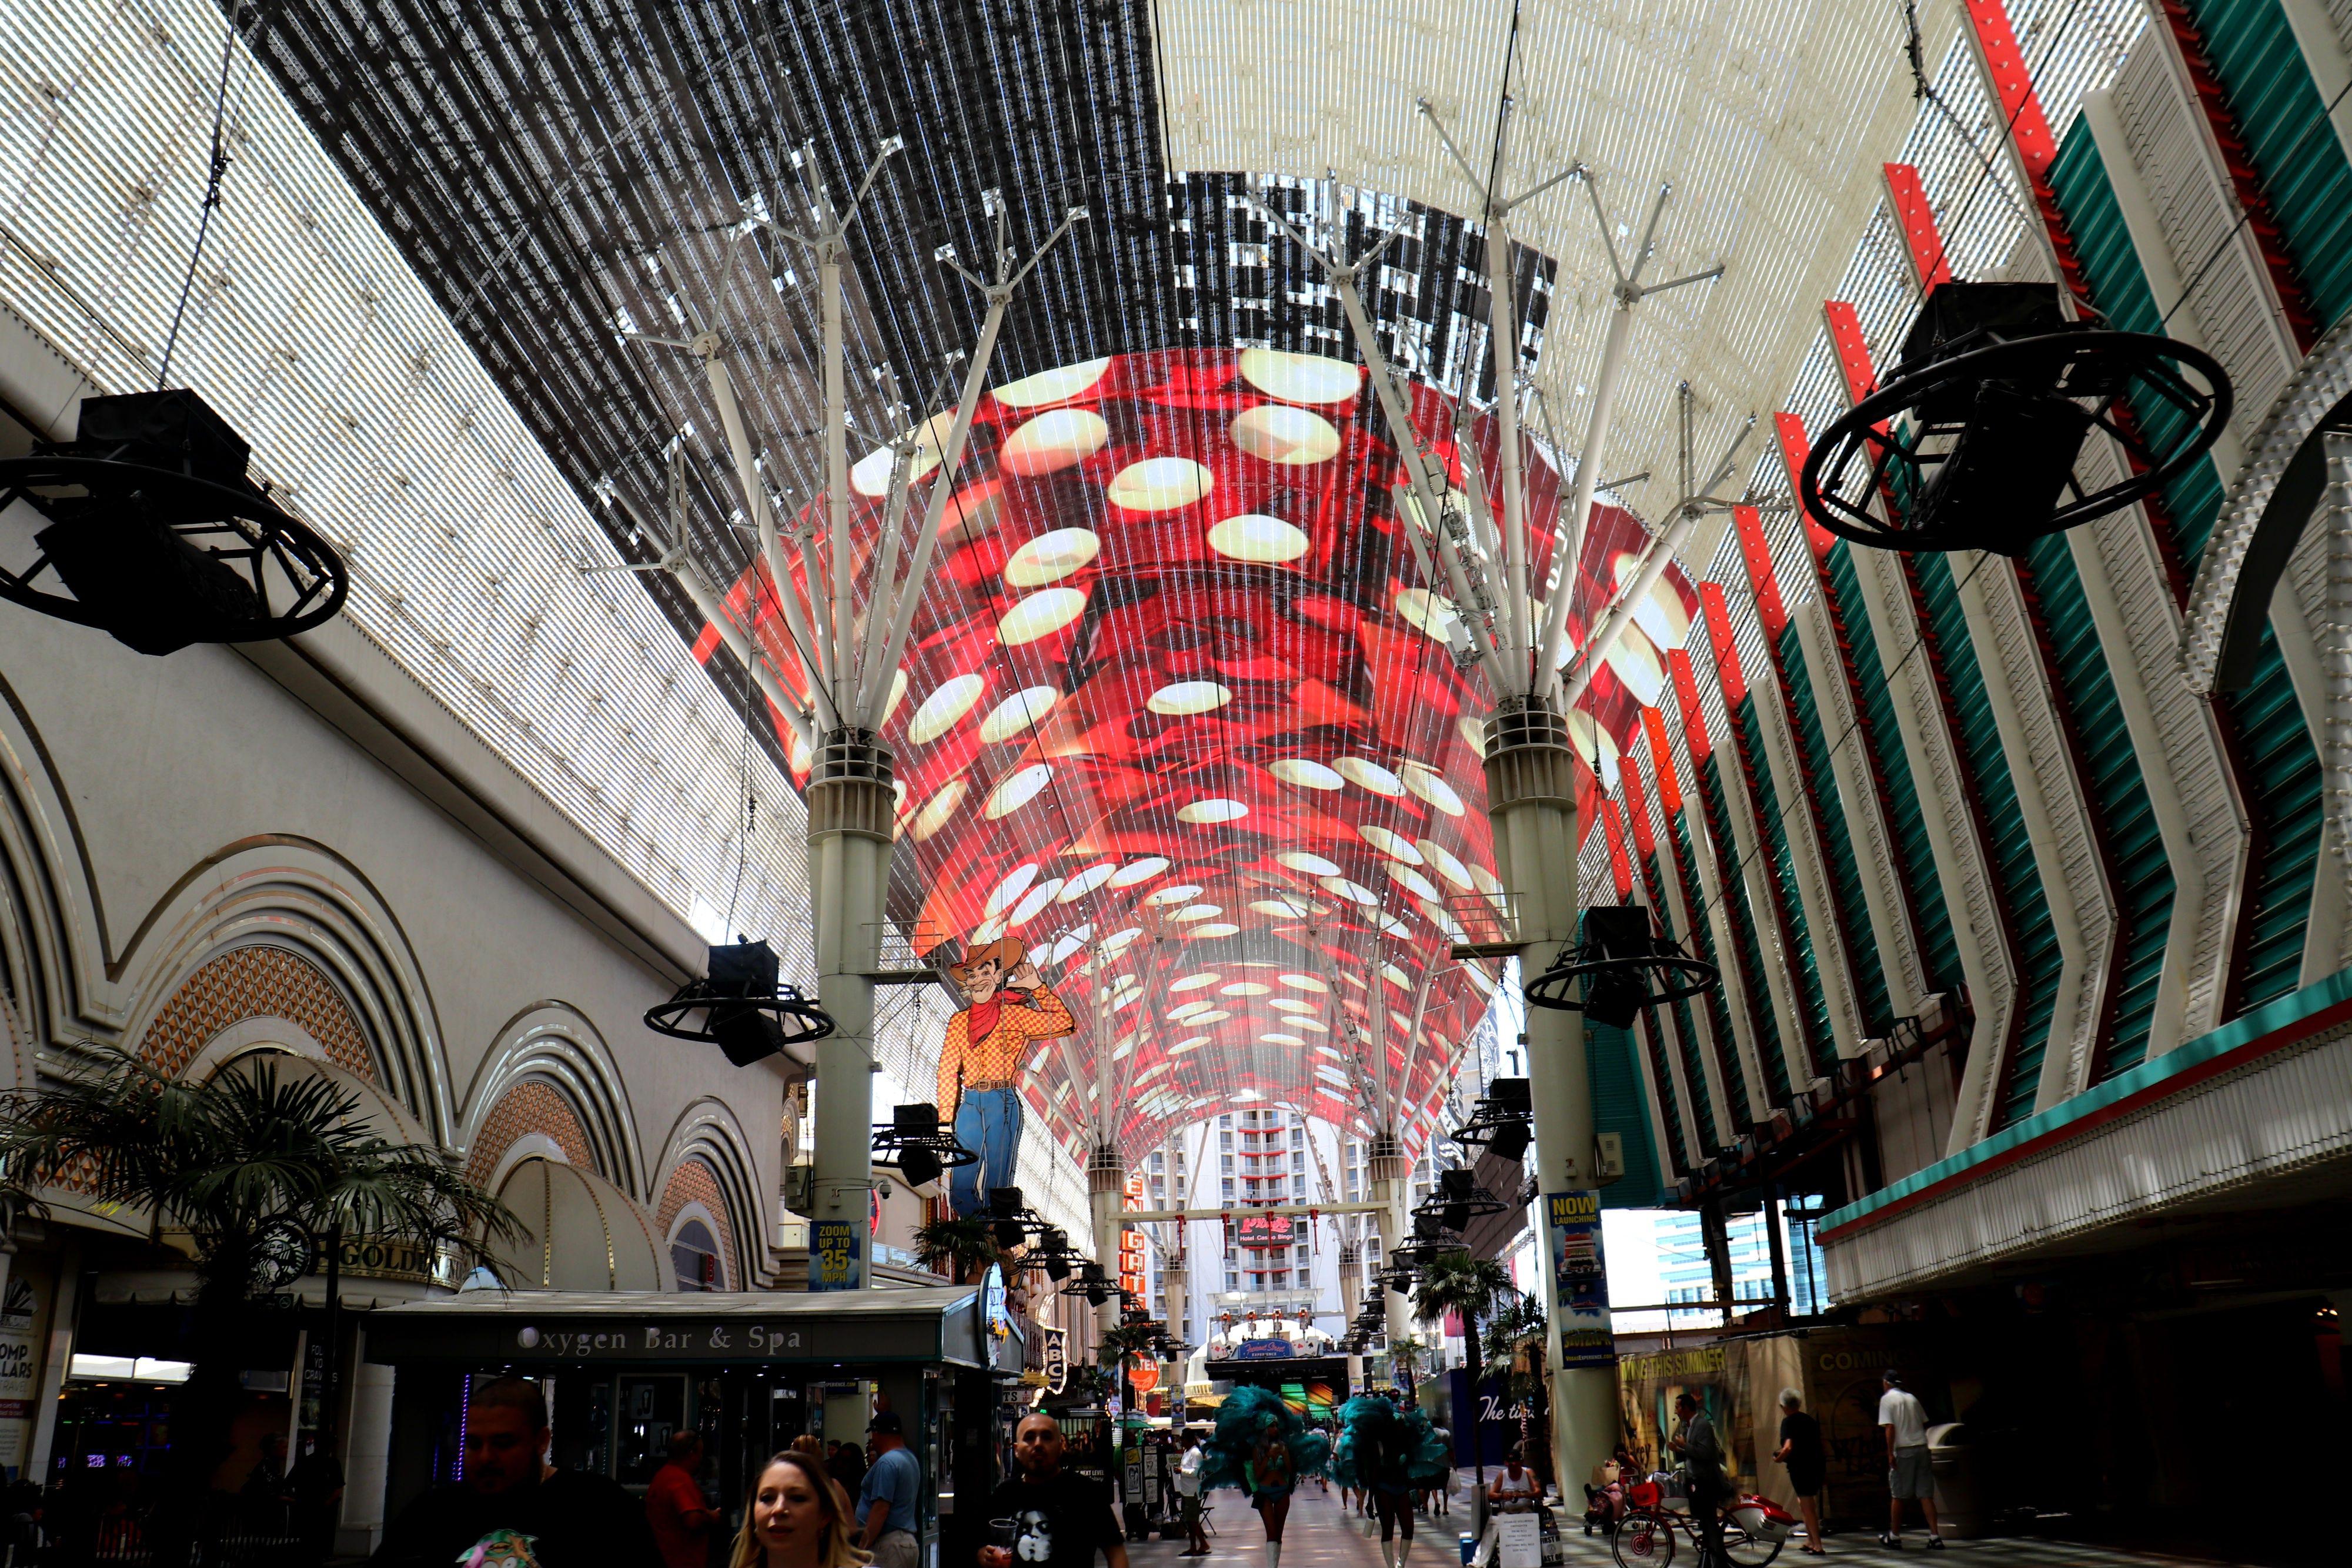 Las Vegas' famed Fremont Street Experience reopening June 3 ahead of Strip hotels, casinos